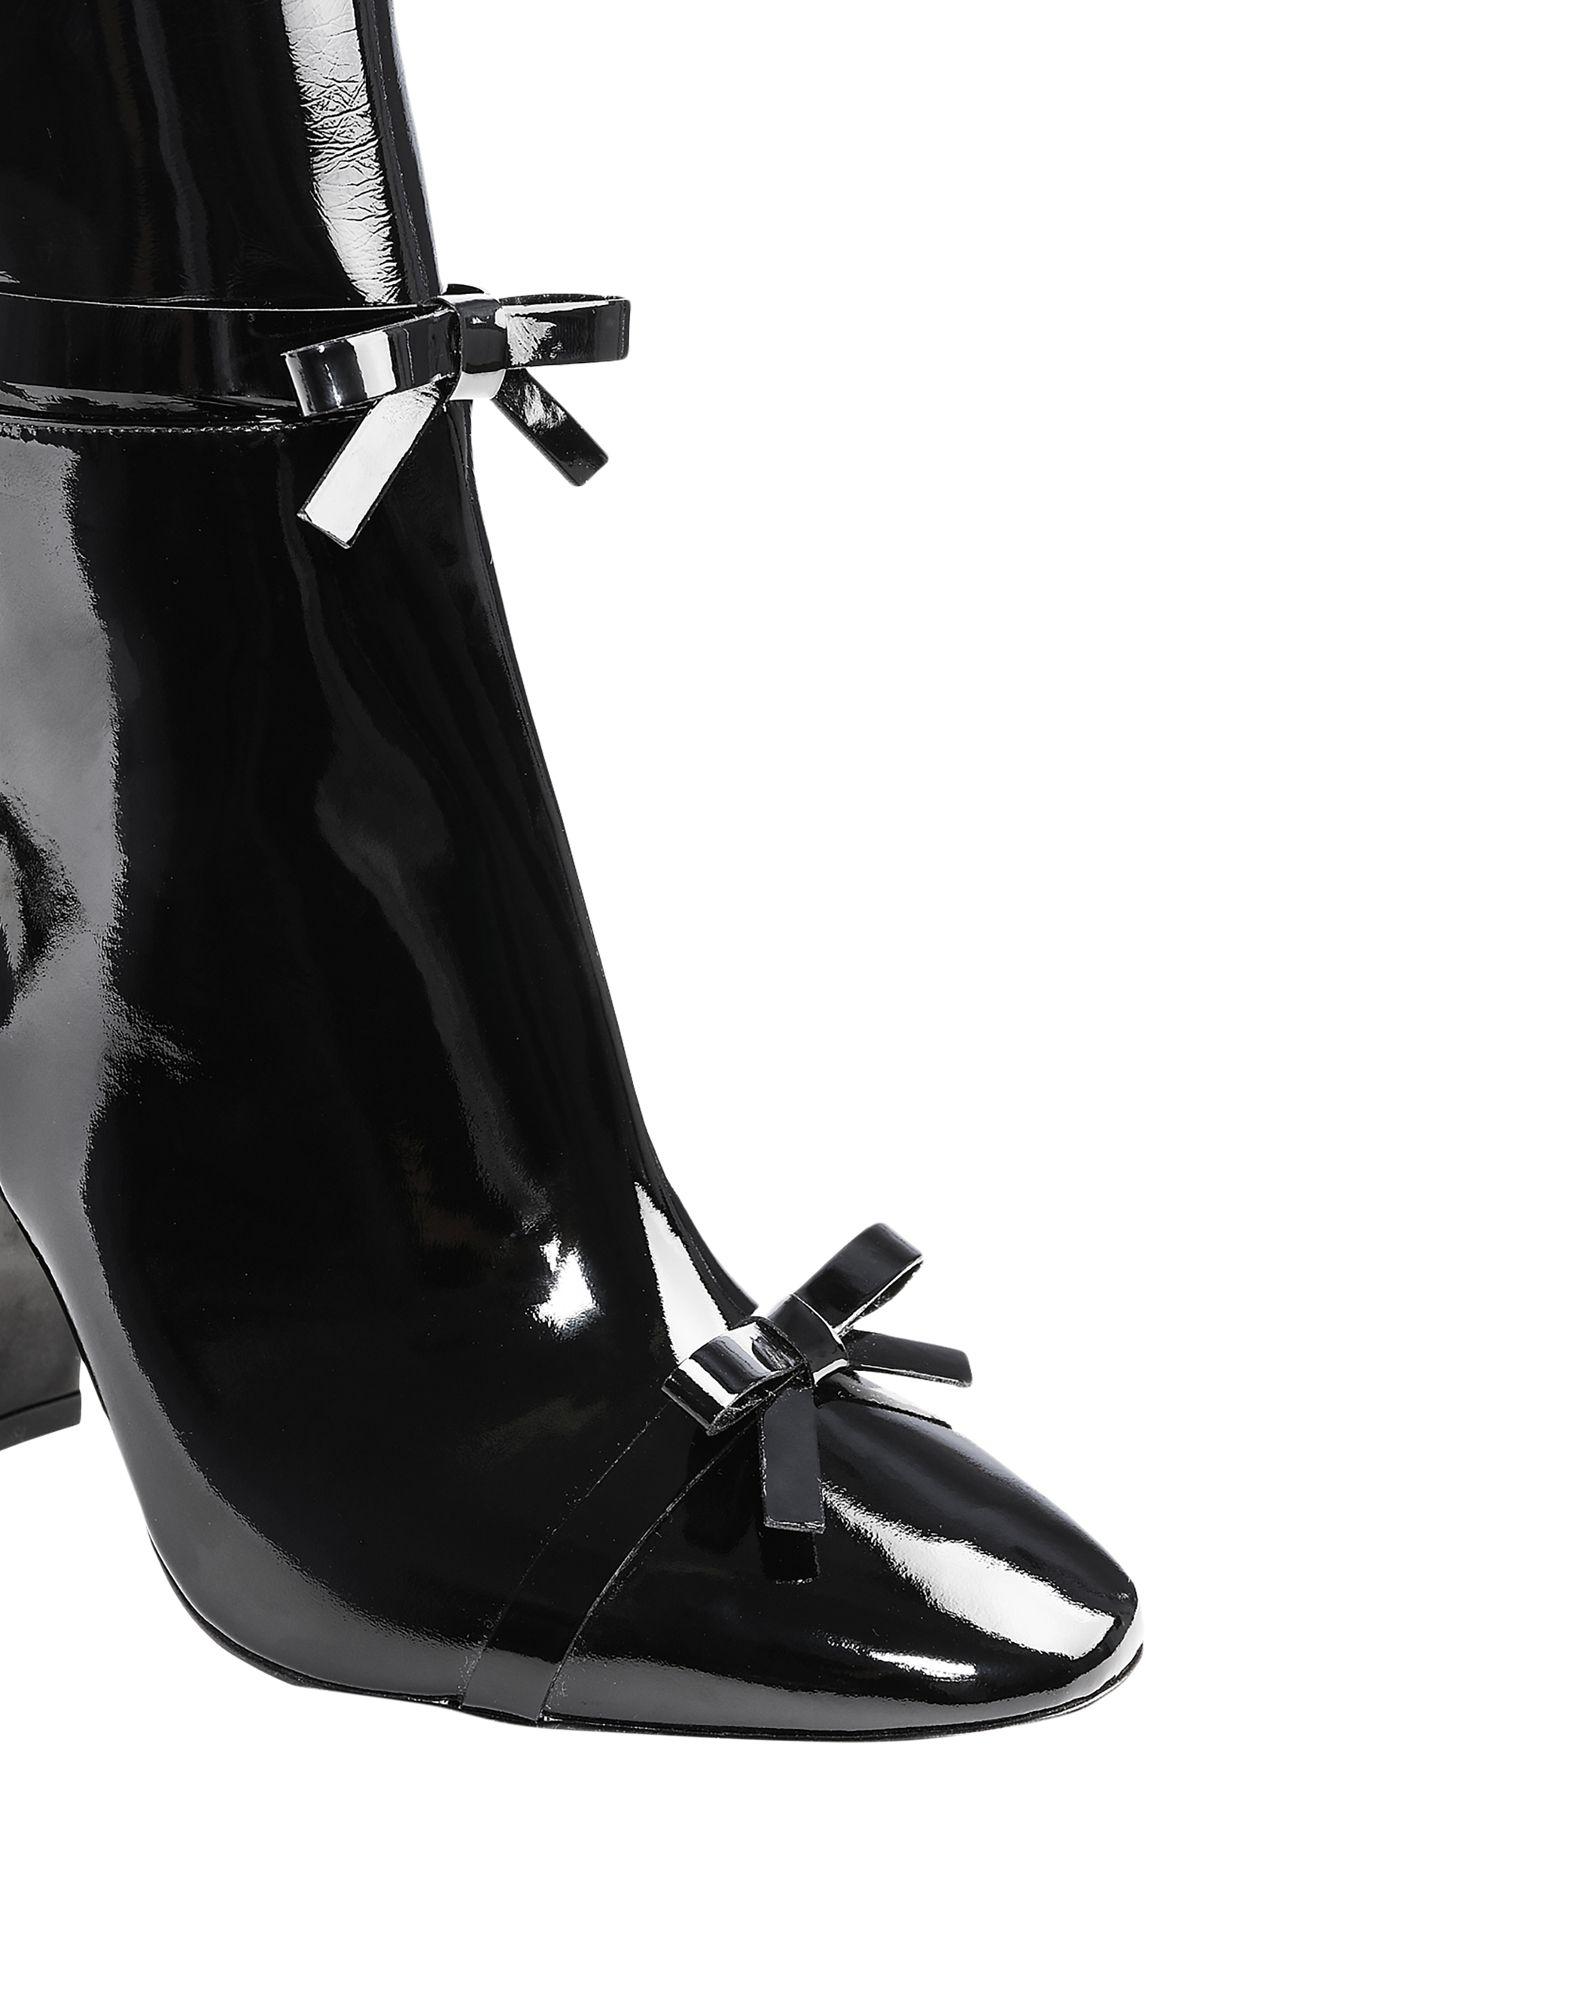 Philosophy - Di Lorenzo Serafini Boots - Philosophy Women Philosophy Di Lorenzo Serafini Boots online on  United Kingdom - 11553622FQ bfed29